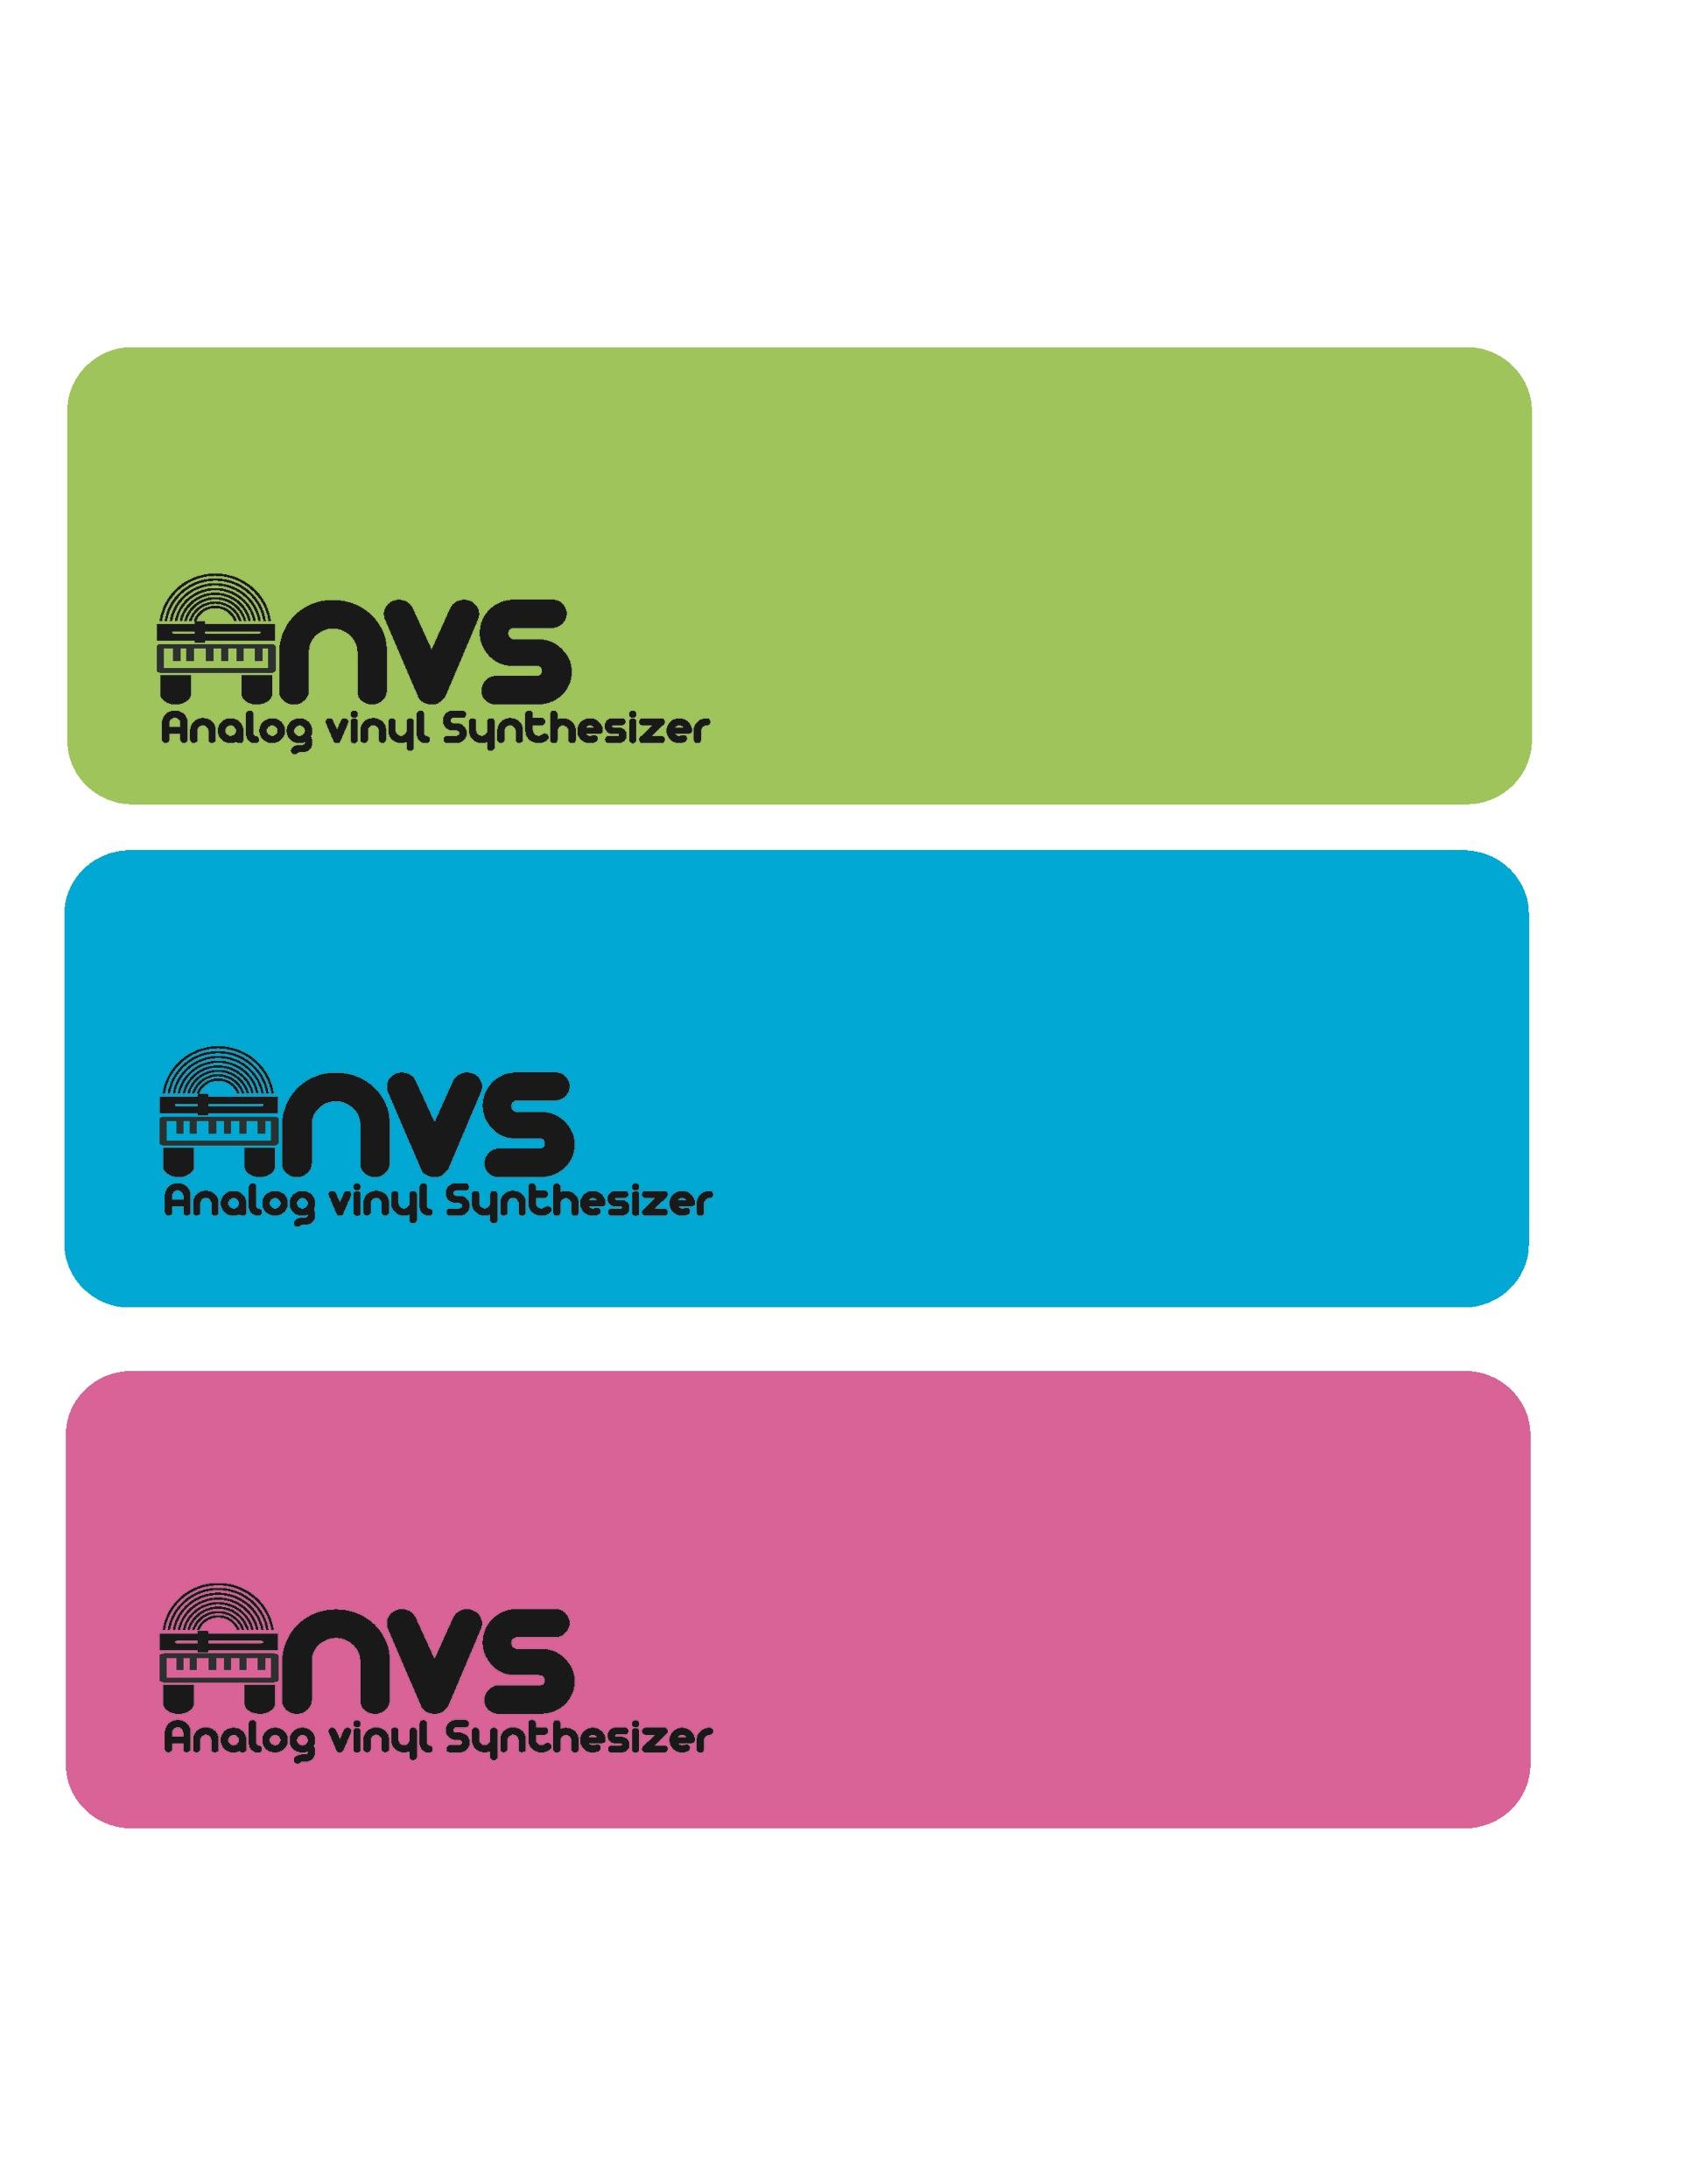 Anvs Logos_f0097833_18525525.jpg